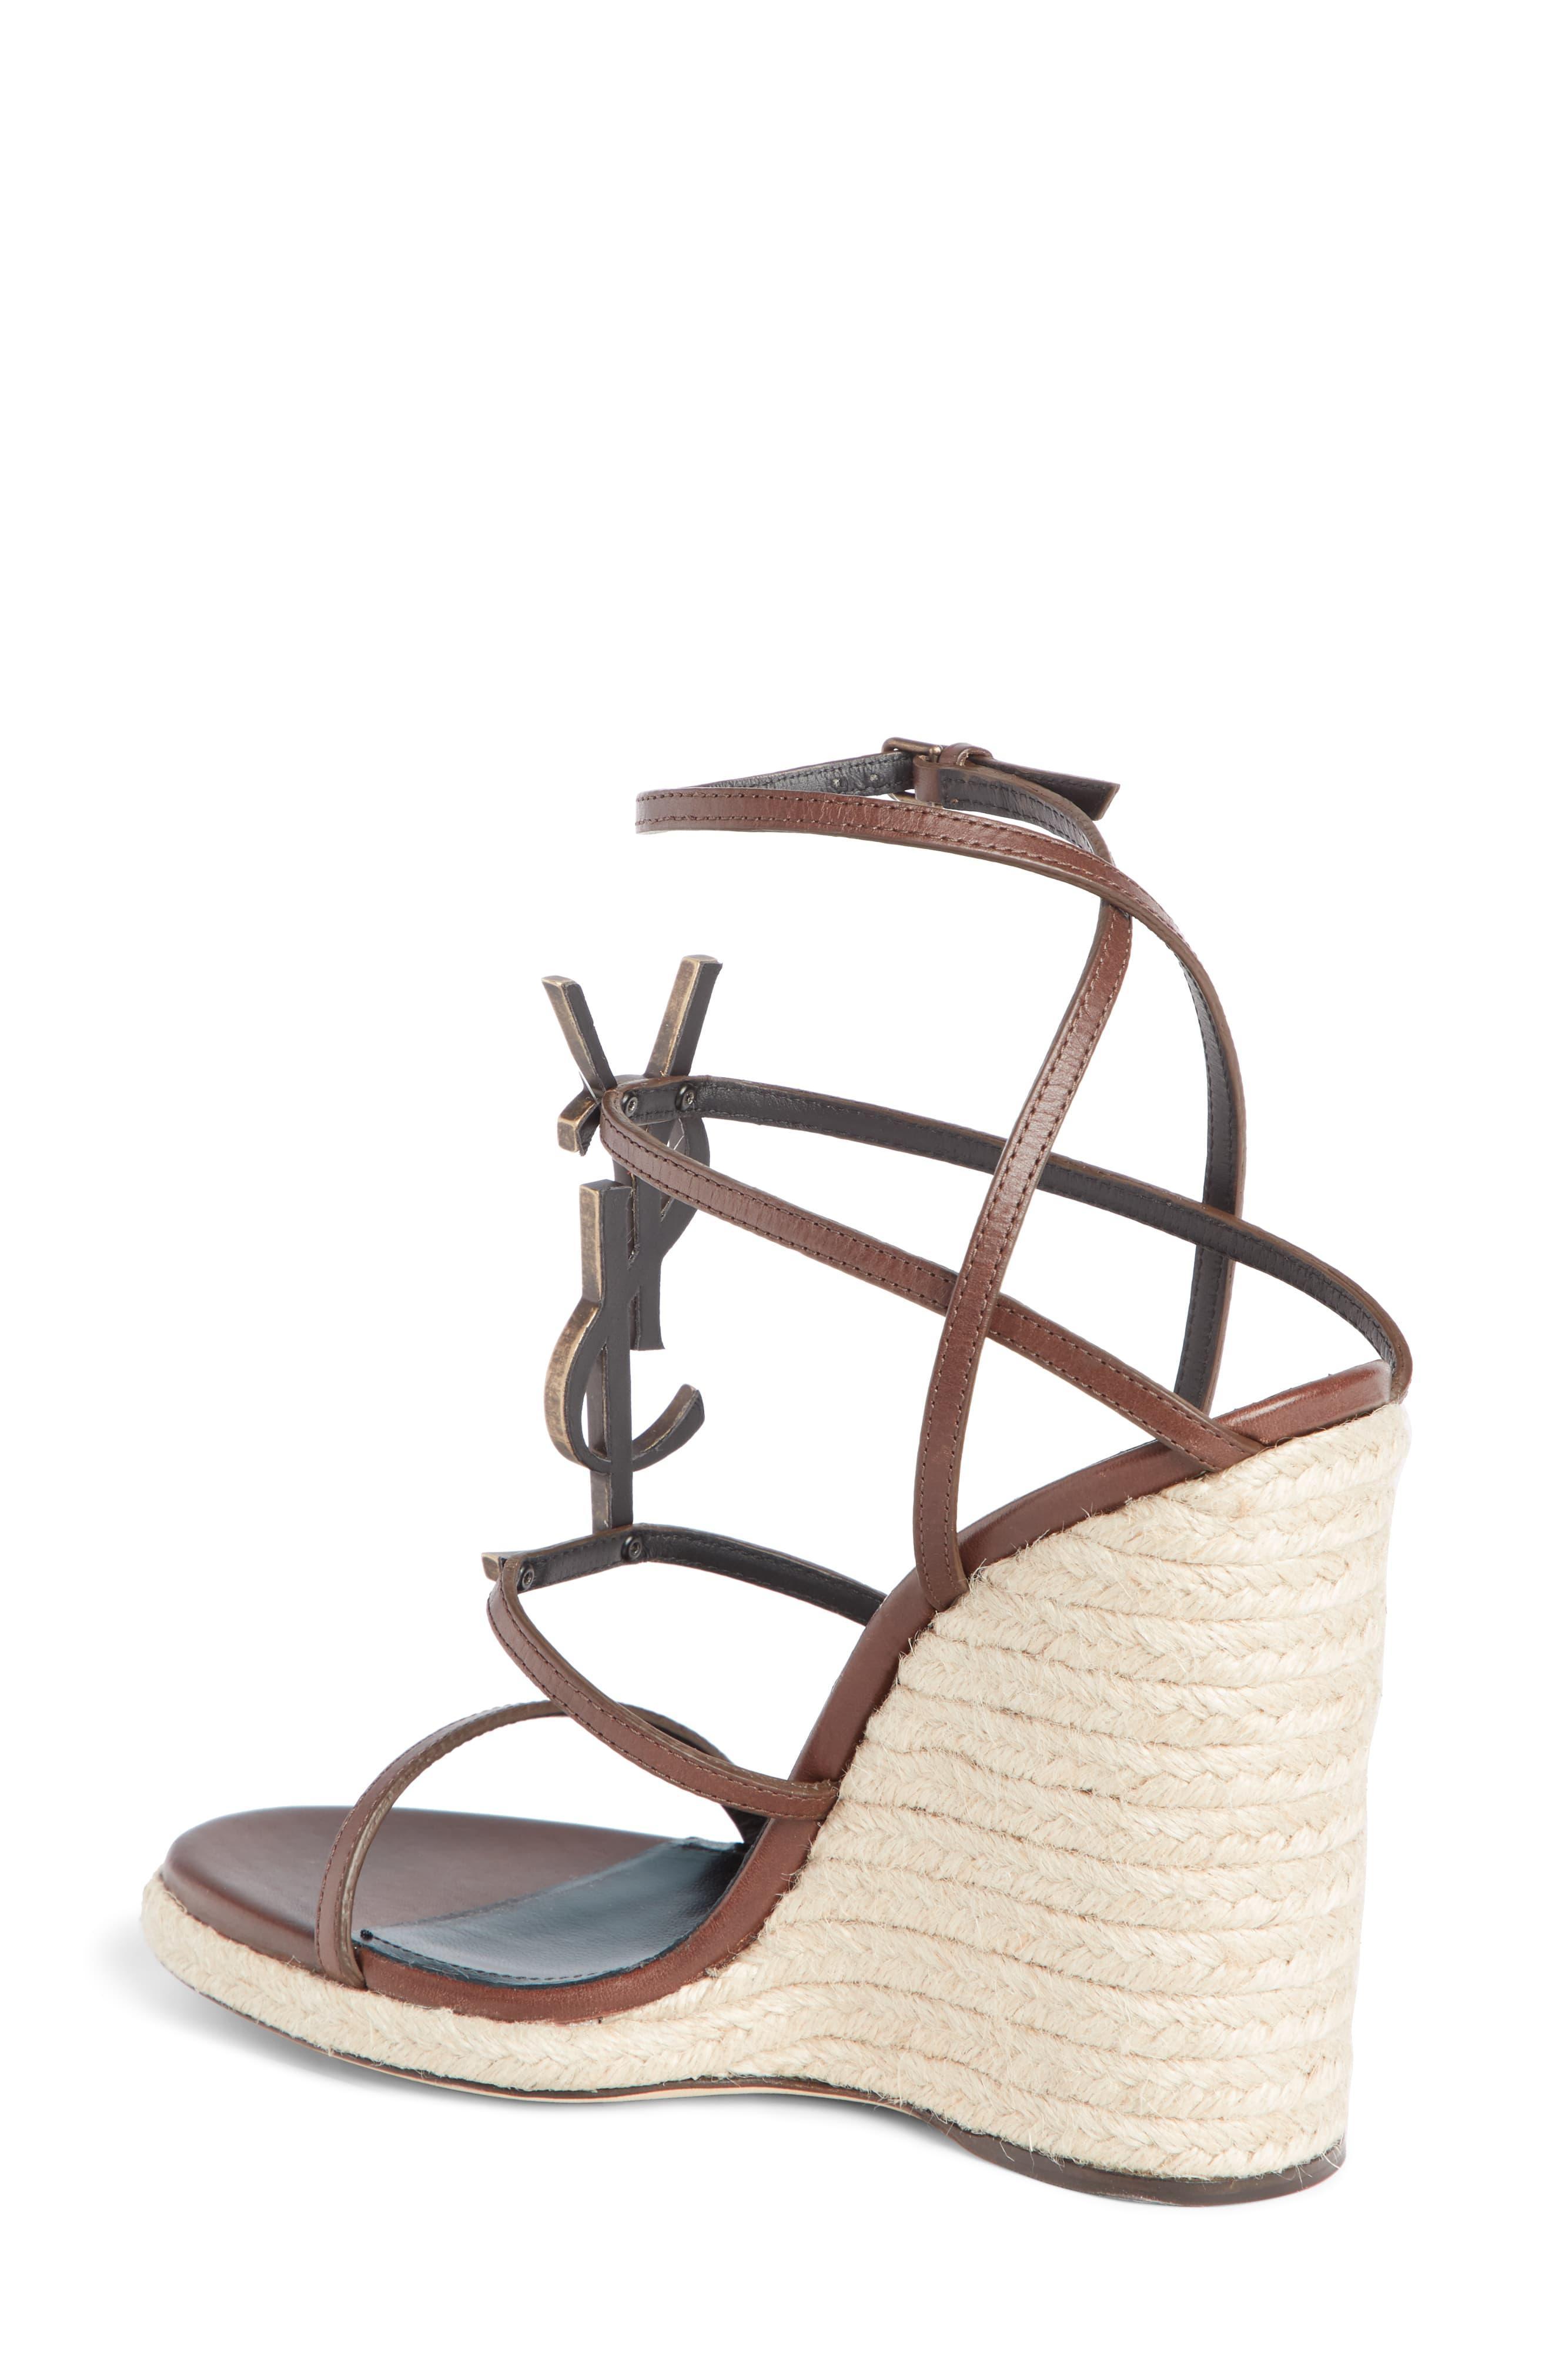 cf1f2194f Saint Laurent Cassandra Ysl Logo Wedge Sandal in Brown - Save 40% - Lyst